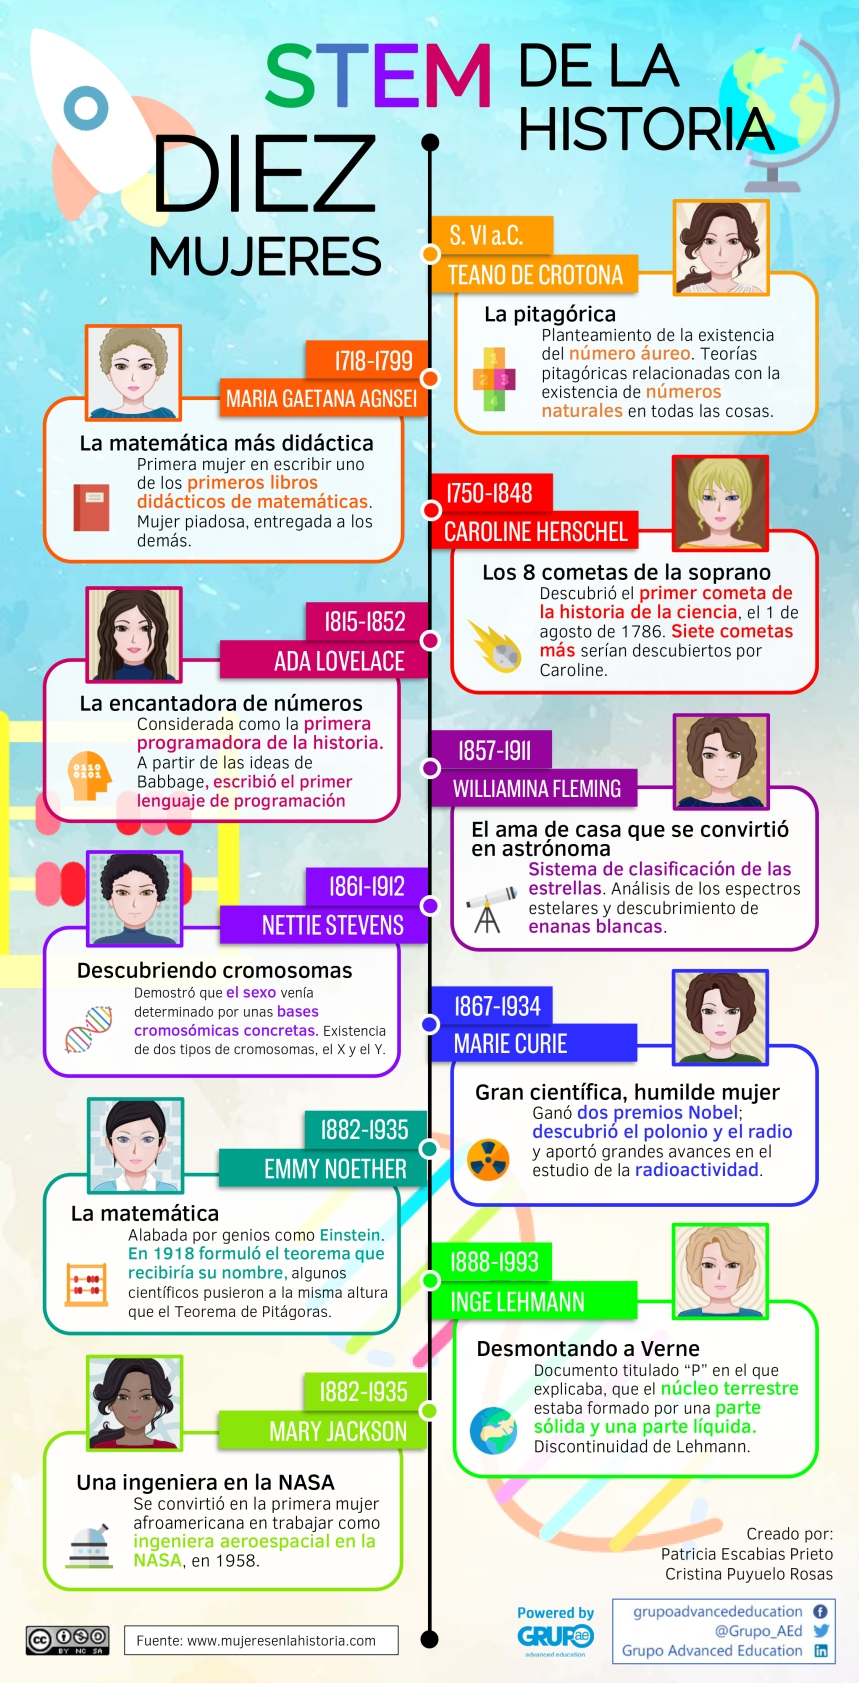 10 mujeres STEM de la Historia